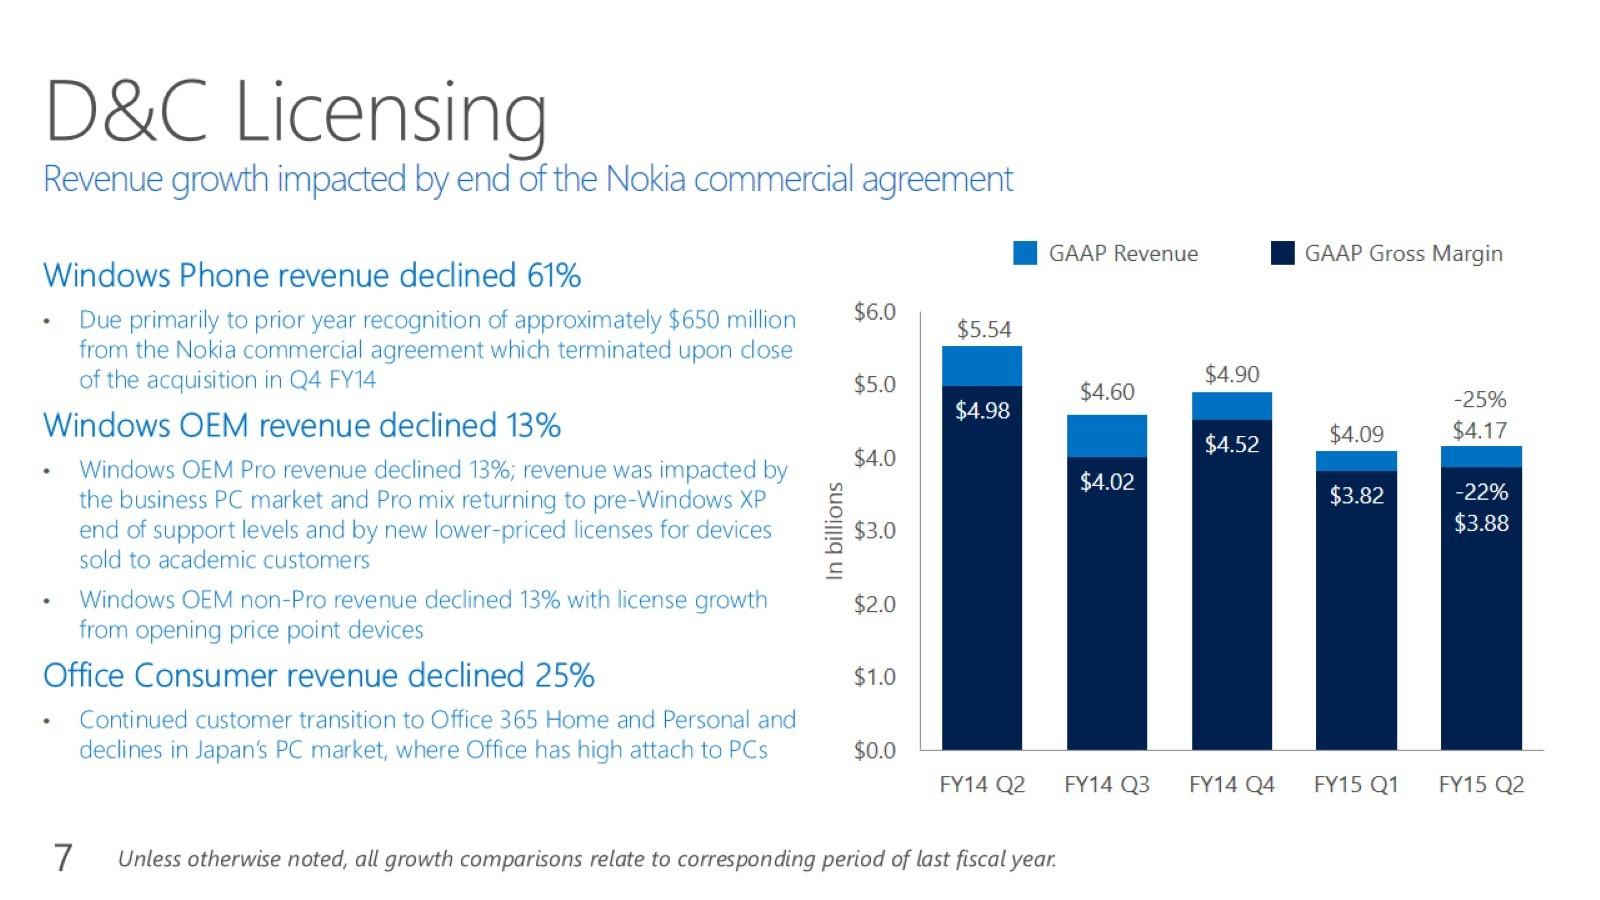 Microsoft Licensing Q2 2015